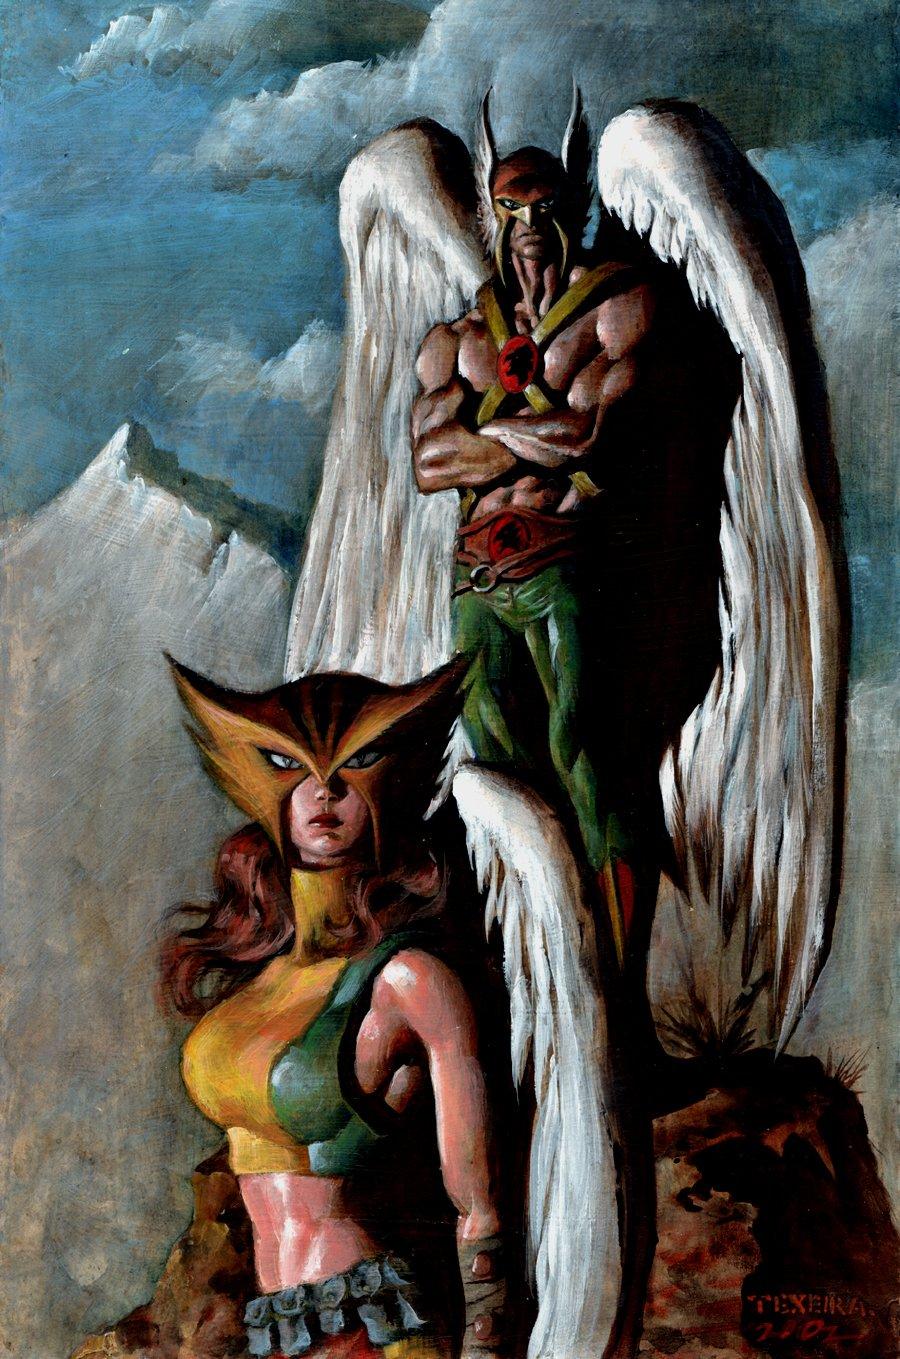 Hawkman & Hawkgirl Full Painting (2002)